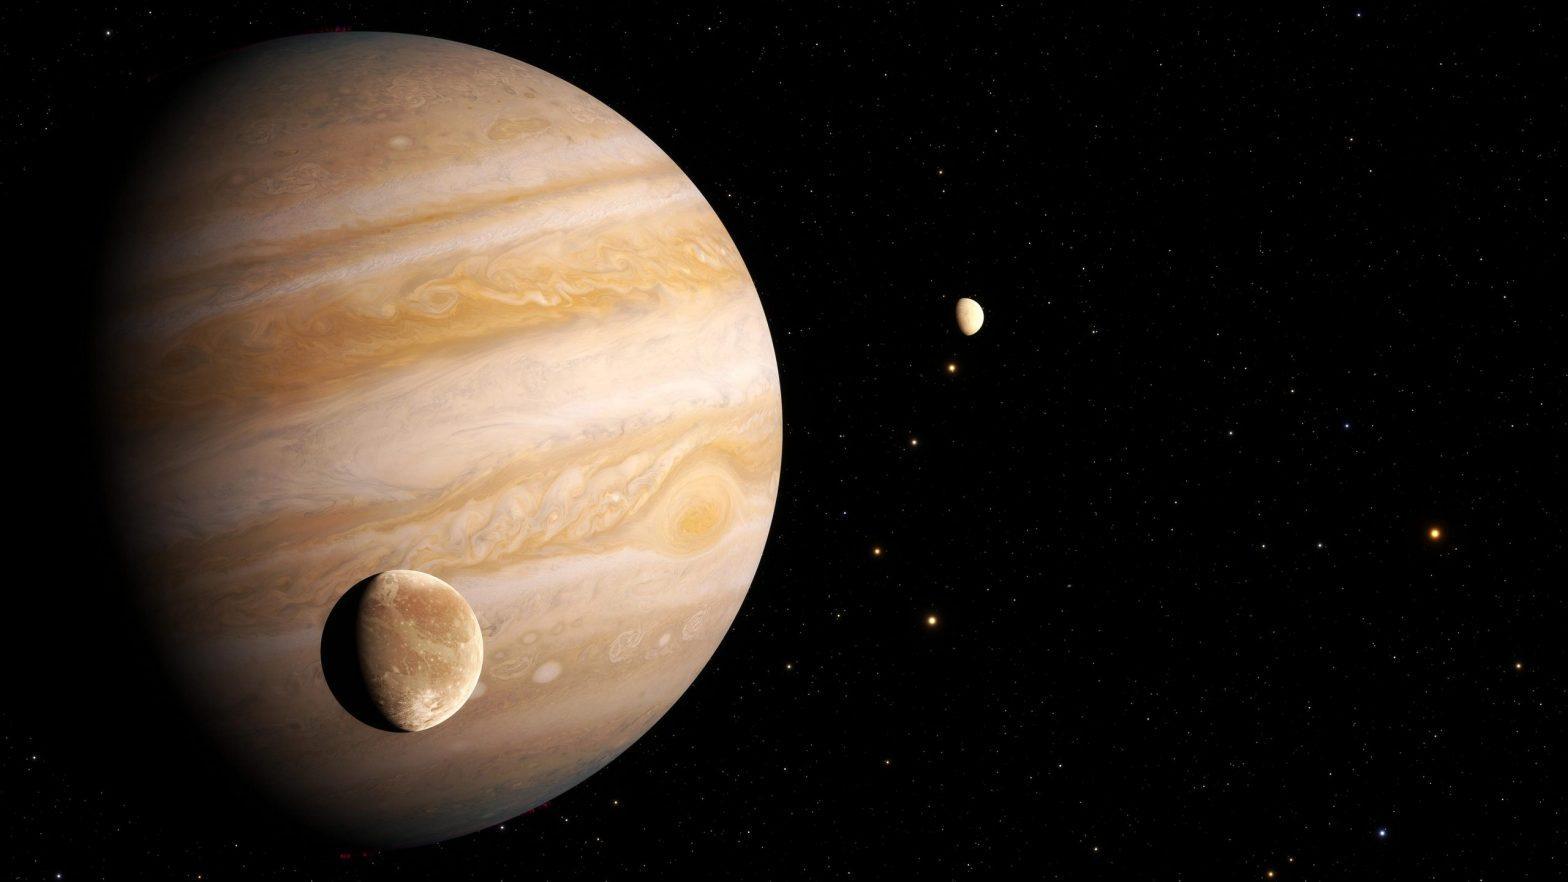 Hubble Finds First Evidence of Water Vapor at Jupiter's Moon Ganymede_40.1